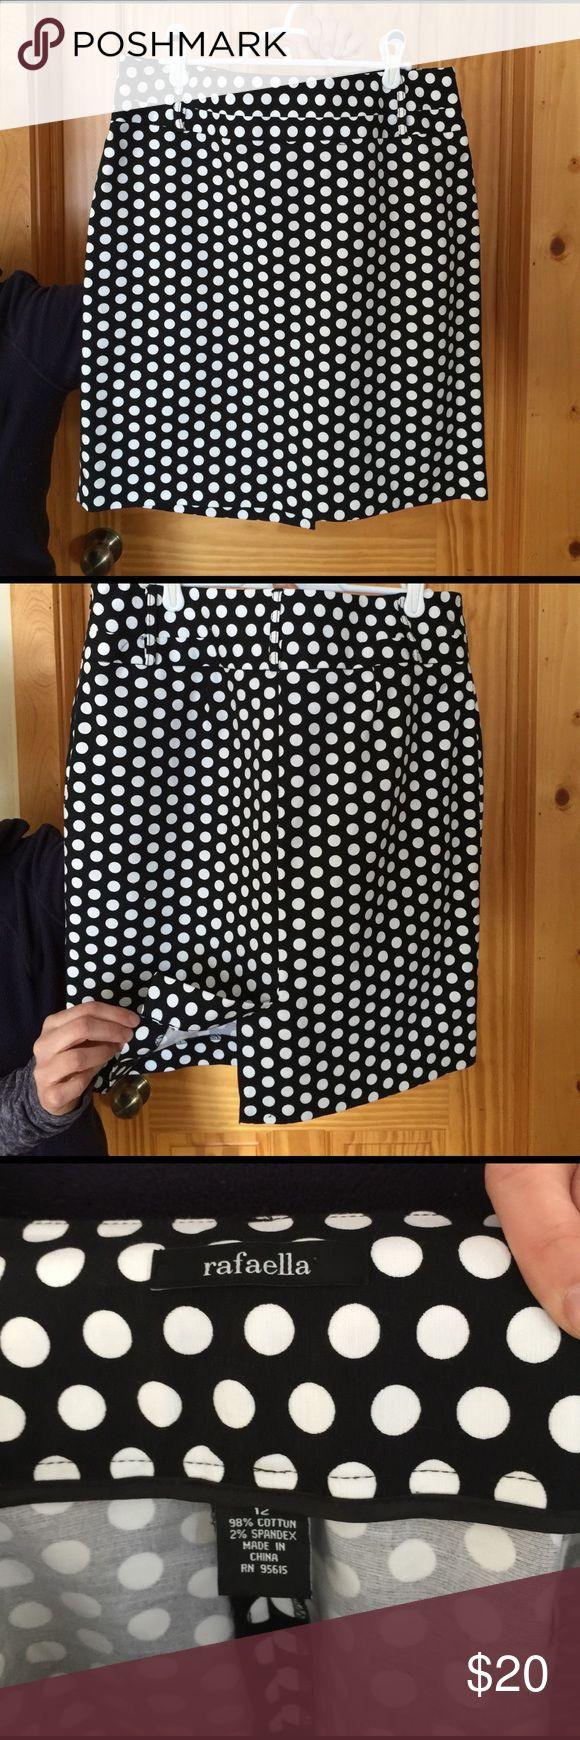 Rafaella Polka Dot Skirt Stunning Polka dot skirt, great for going out of work,soft, only worn a couple times. Rafaella Skirts Pencil